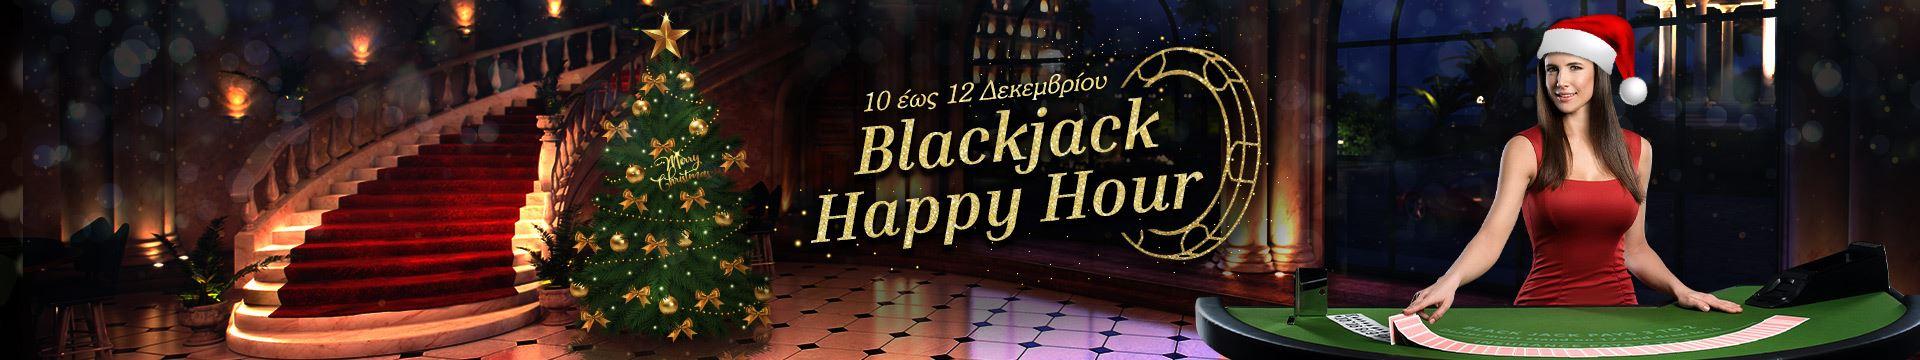 Blackjack Happy Hour